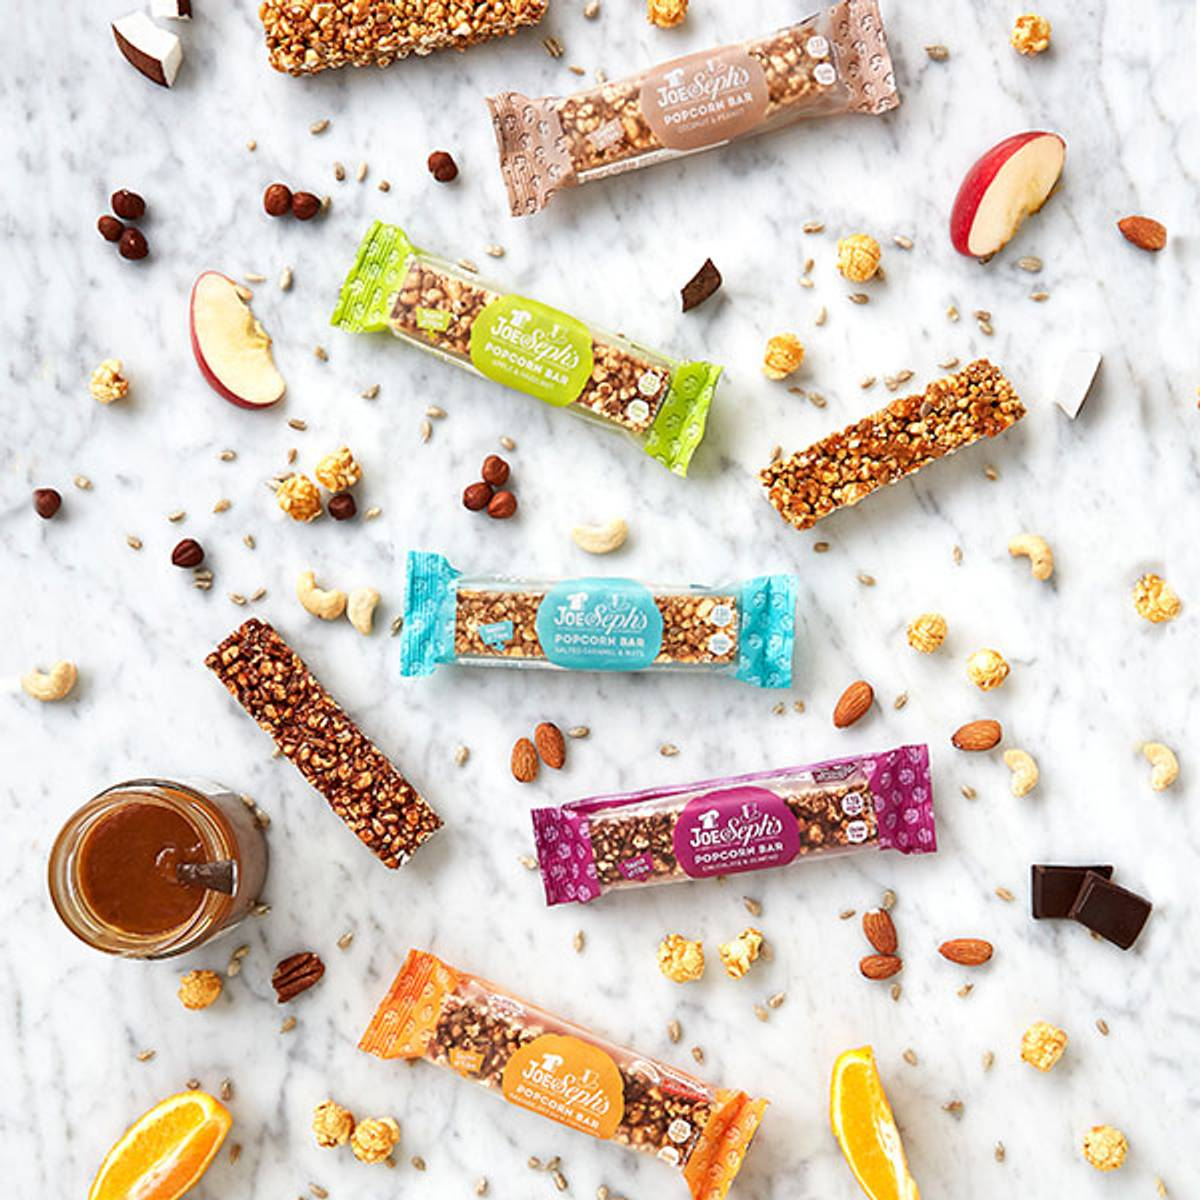 Joe & Sephs - Popcorn Bar - Coconut & Peanut 27g